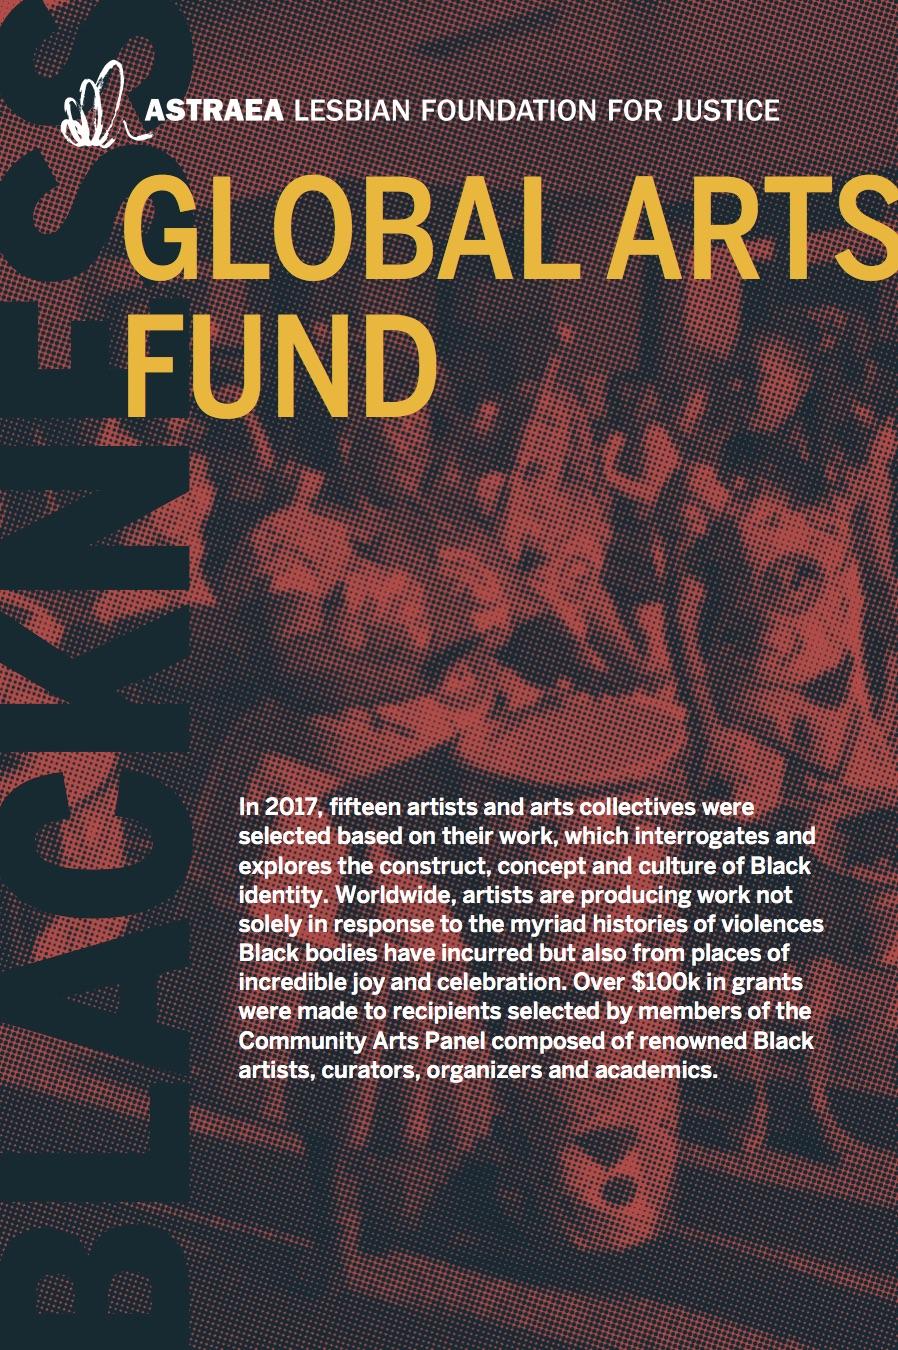 Global Arts Fund 2017 Brochure